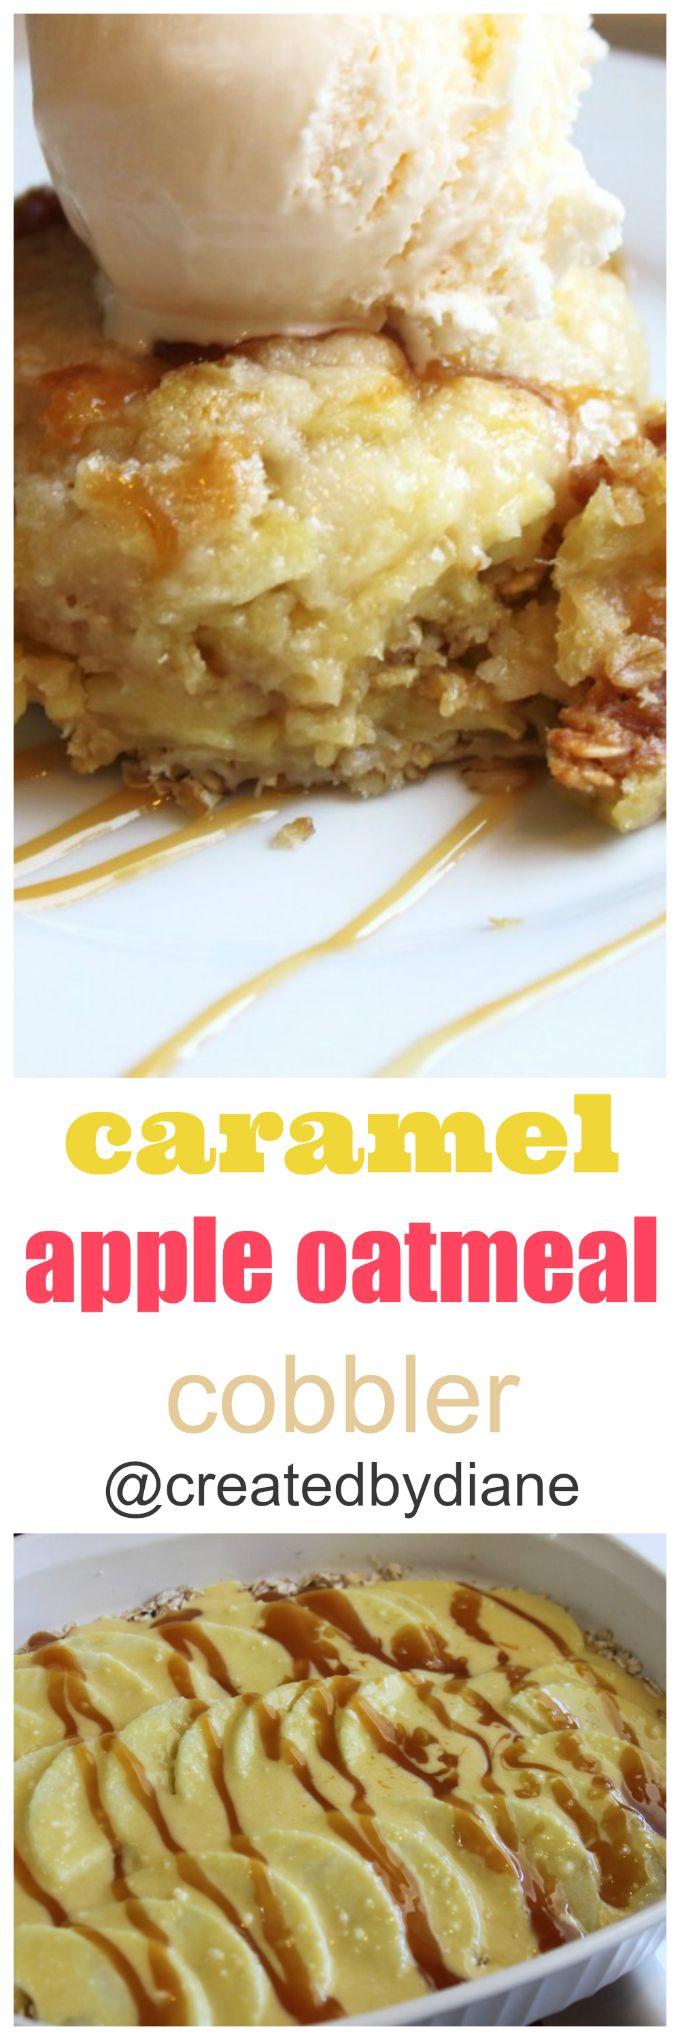 caramel apple oatmeal cobbler @createdbydiane